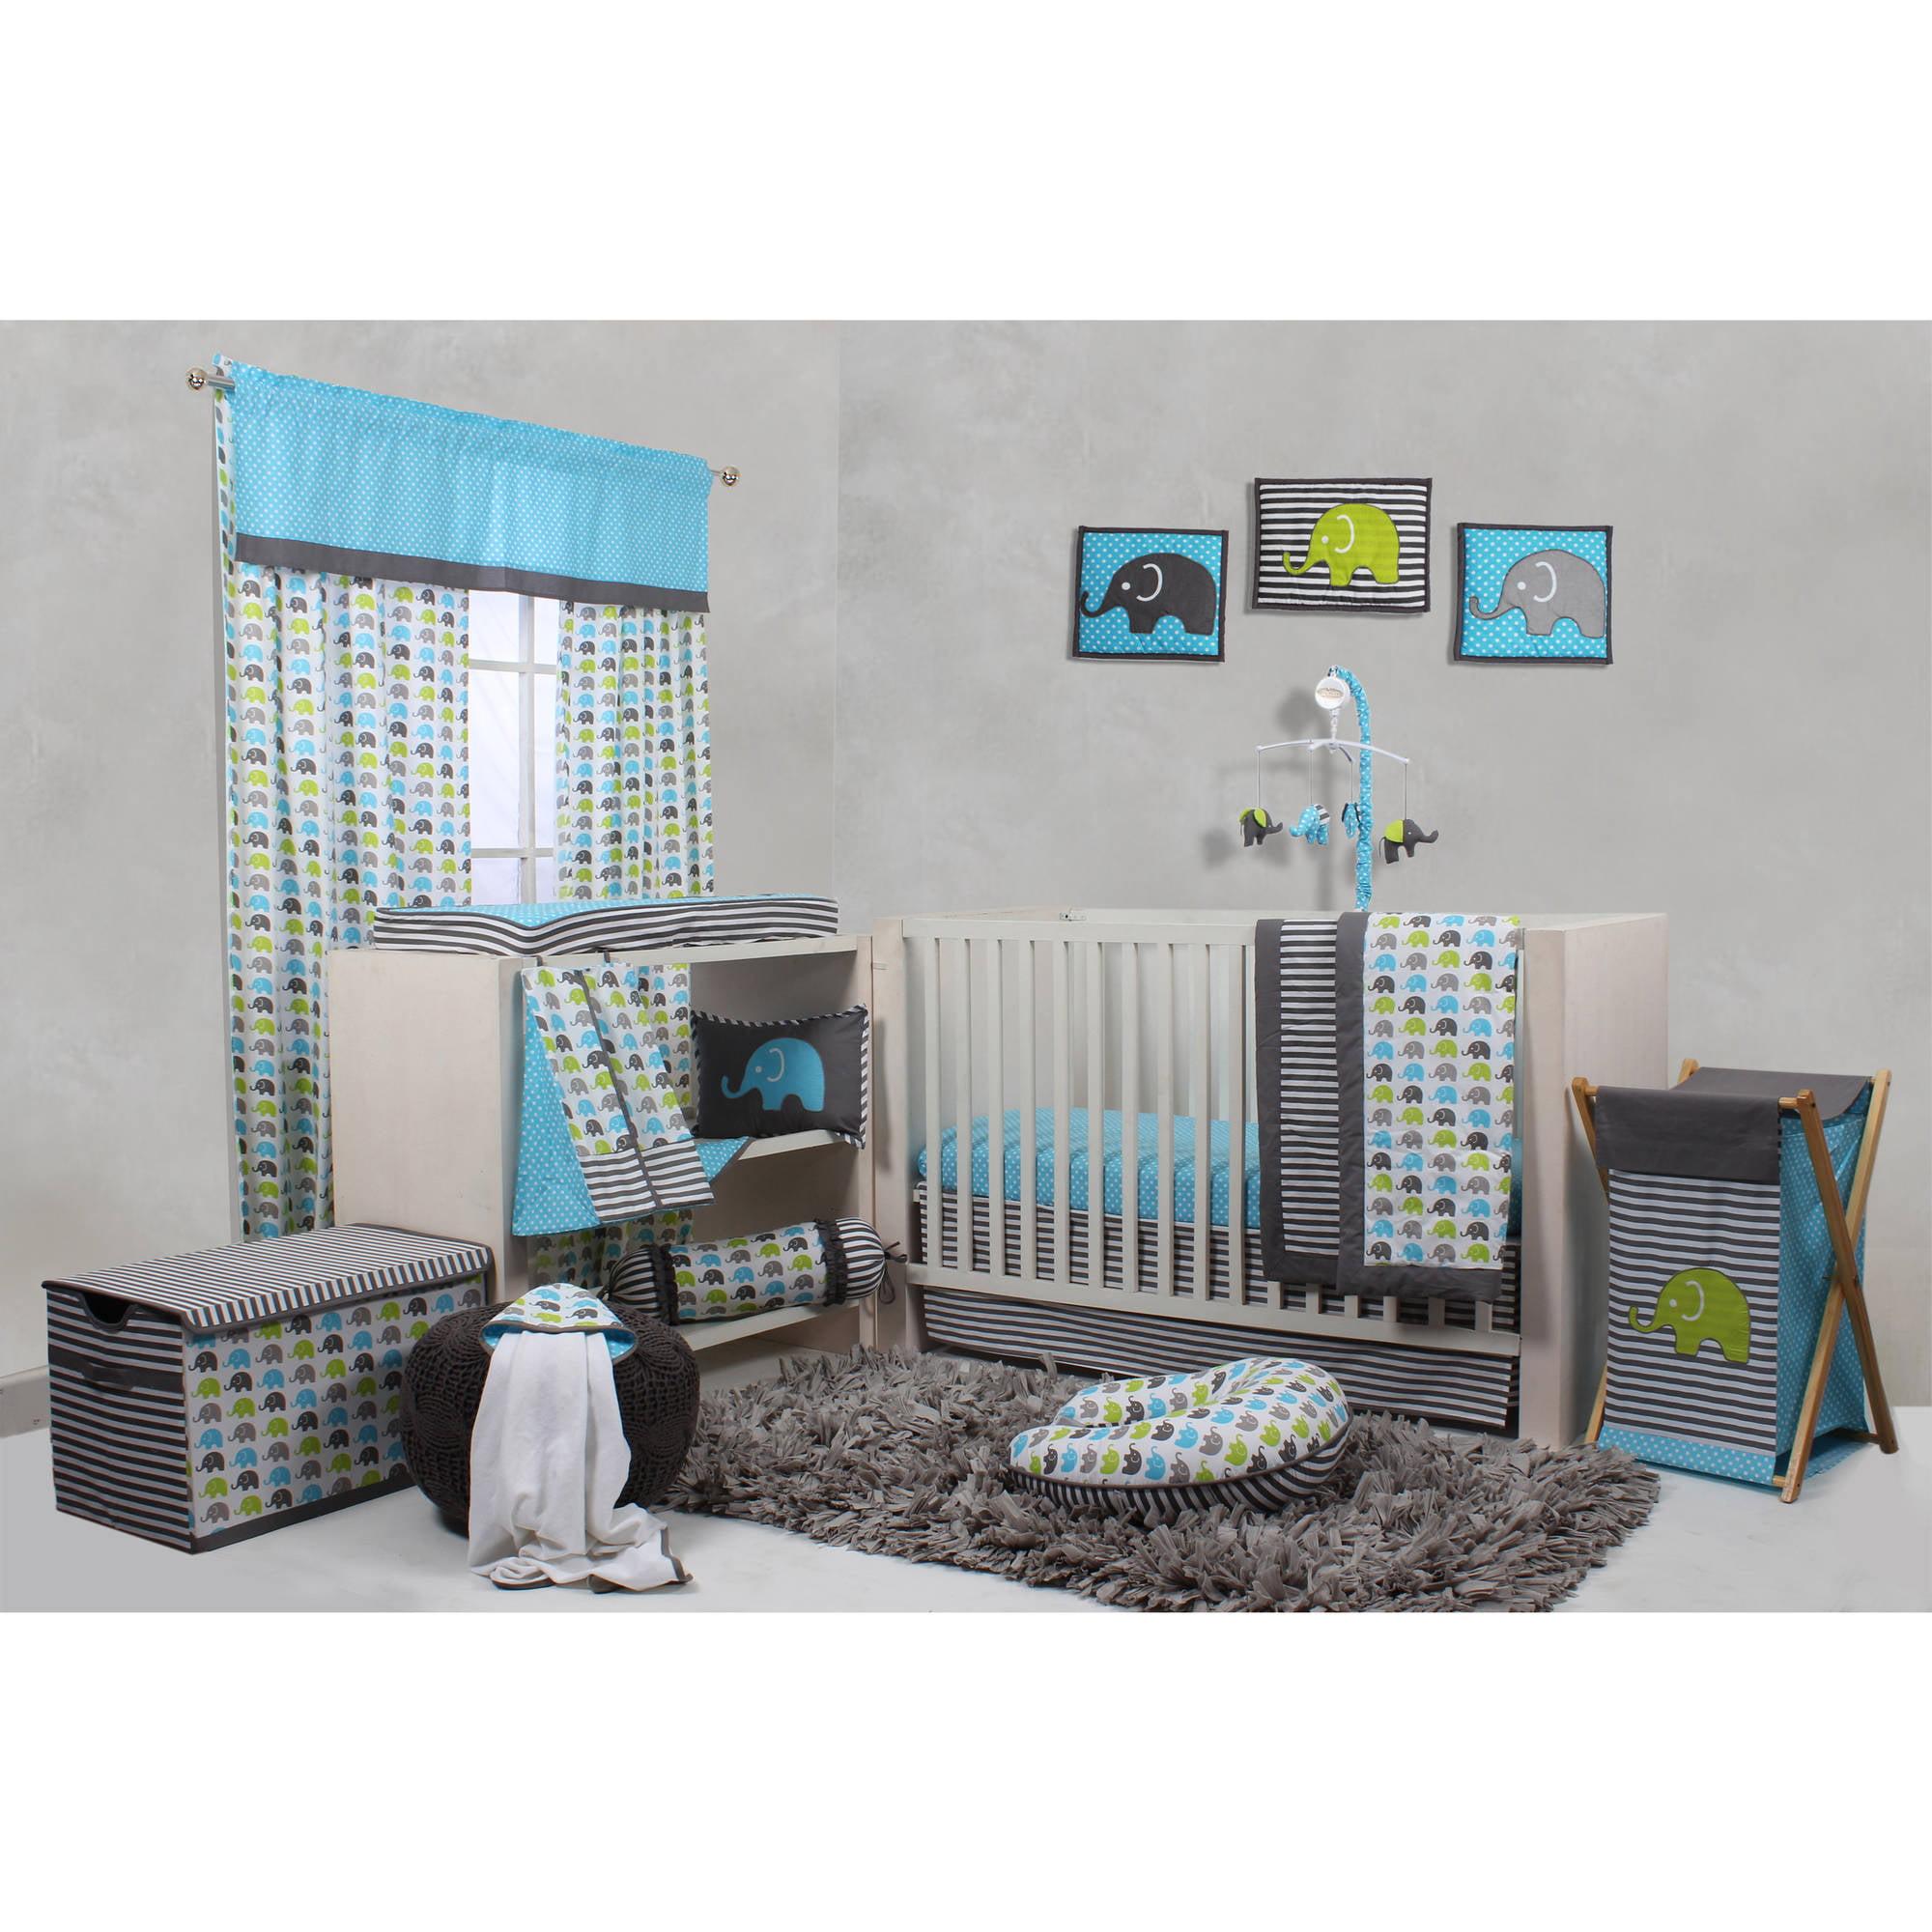 Bacati Elephants 10 Piece Crib Bedding Set, Aqua